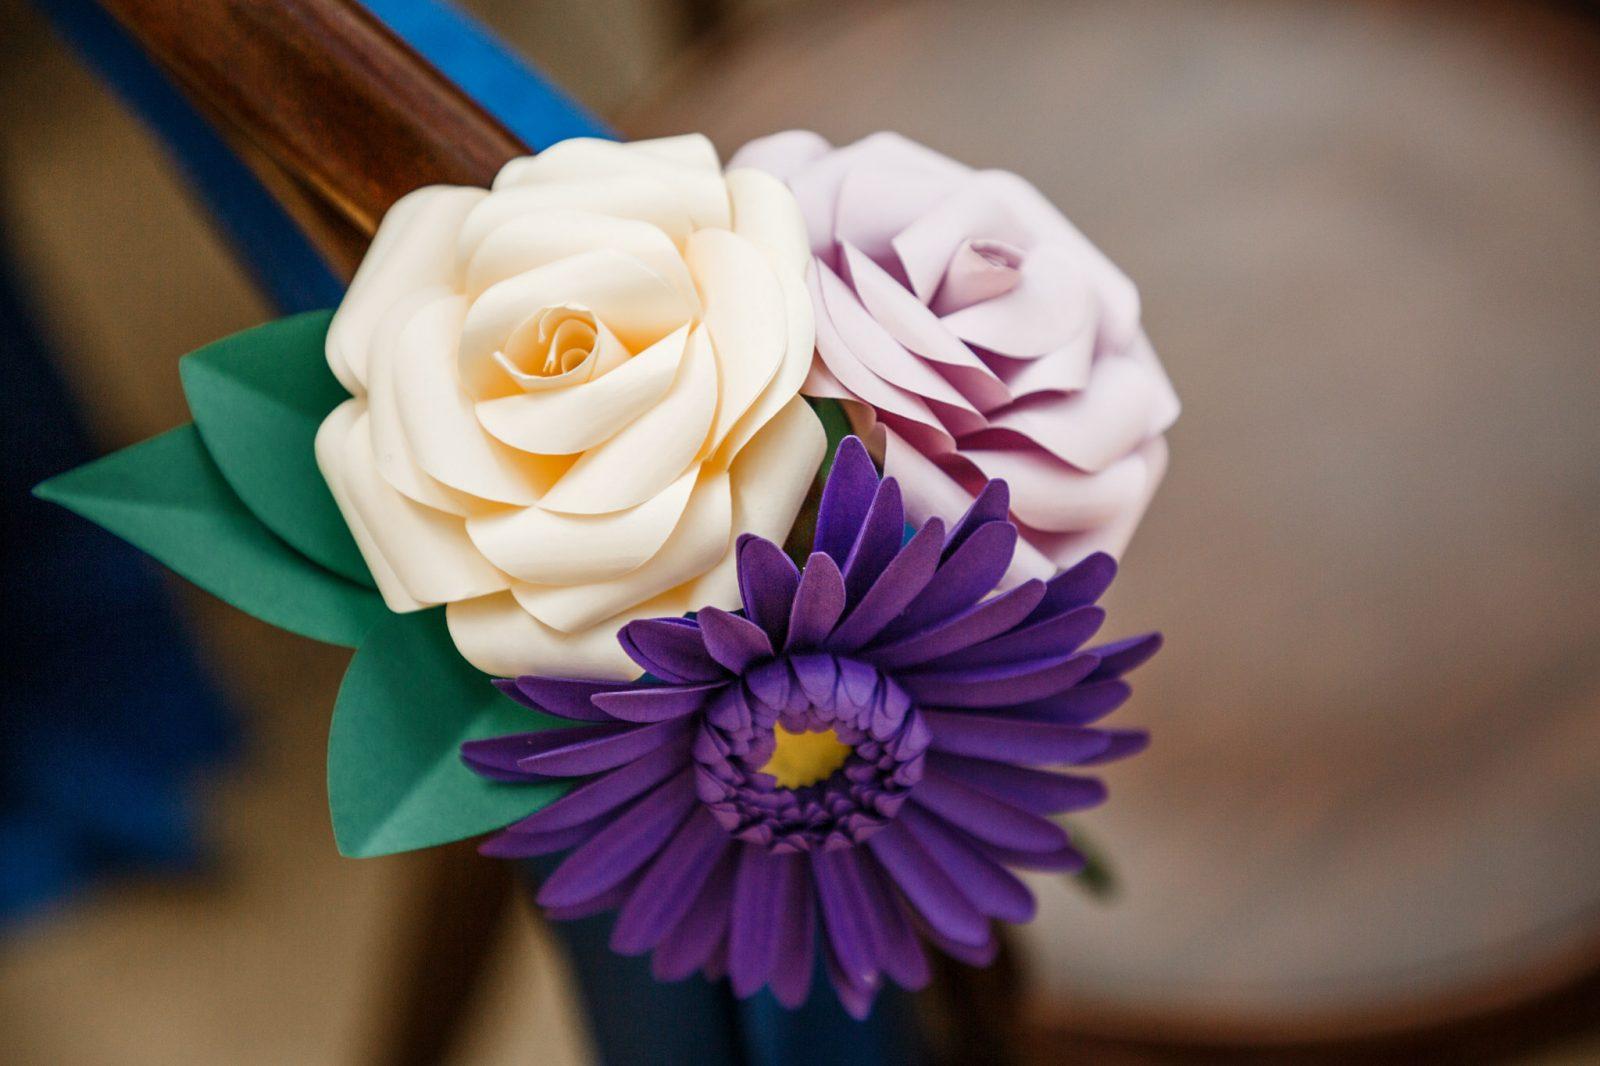 wedding-decoration-ideas-paper-flowers-purple-cream